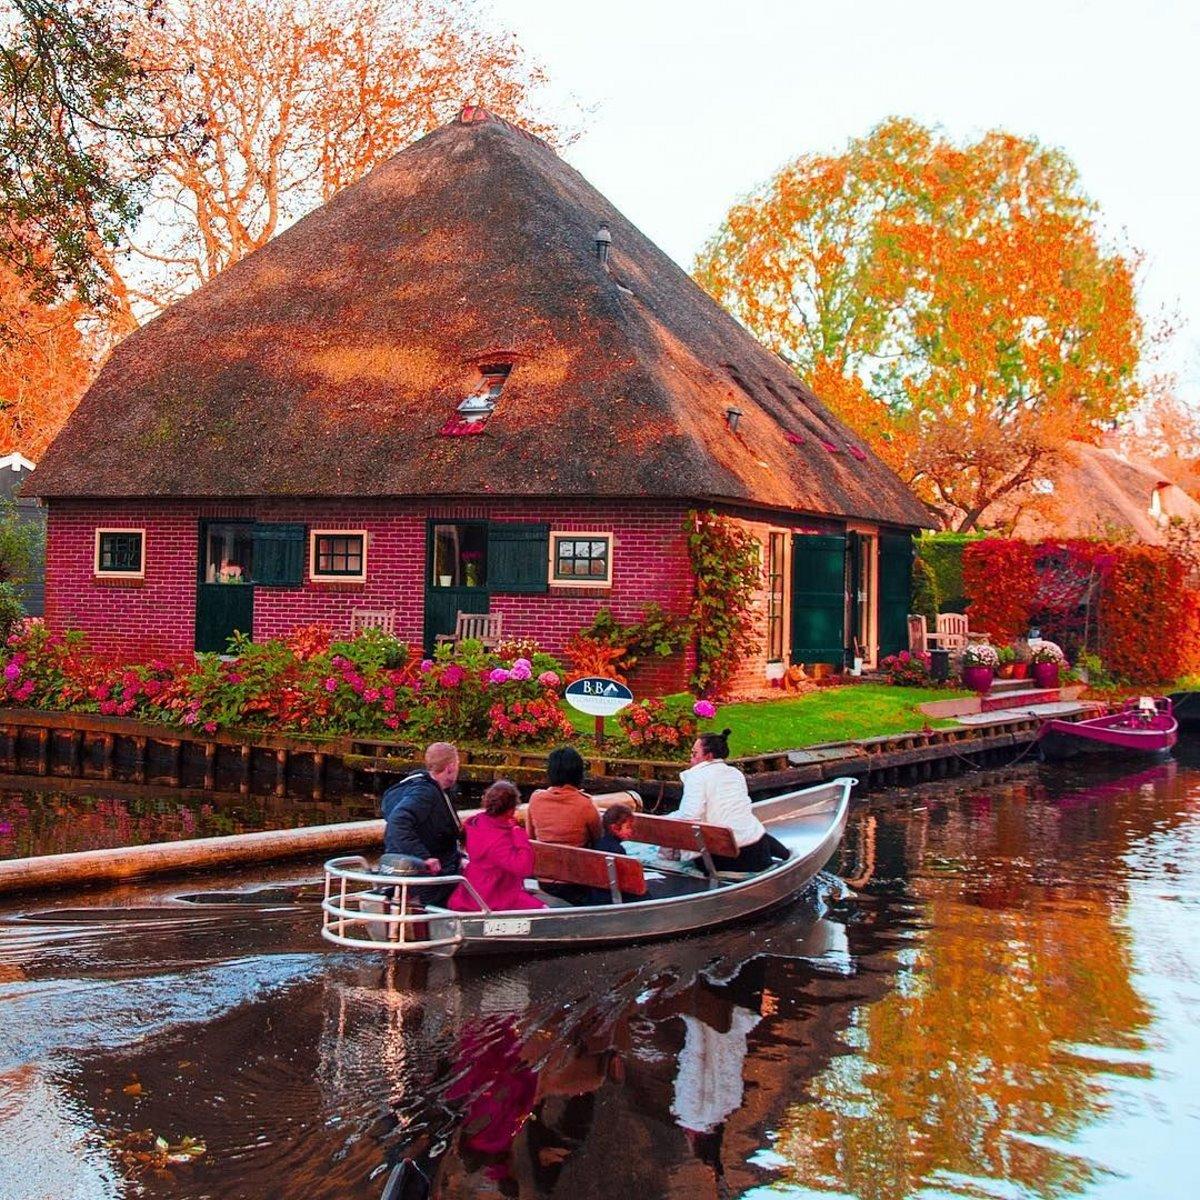 Giethoorn χωριό Ολλανδίας σπίτι σε ποτάμι με ιδιαίτερα χρώματα